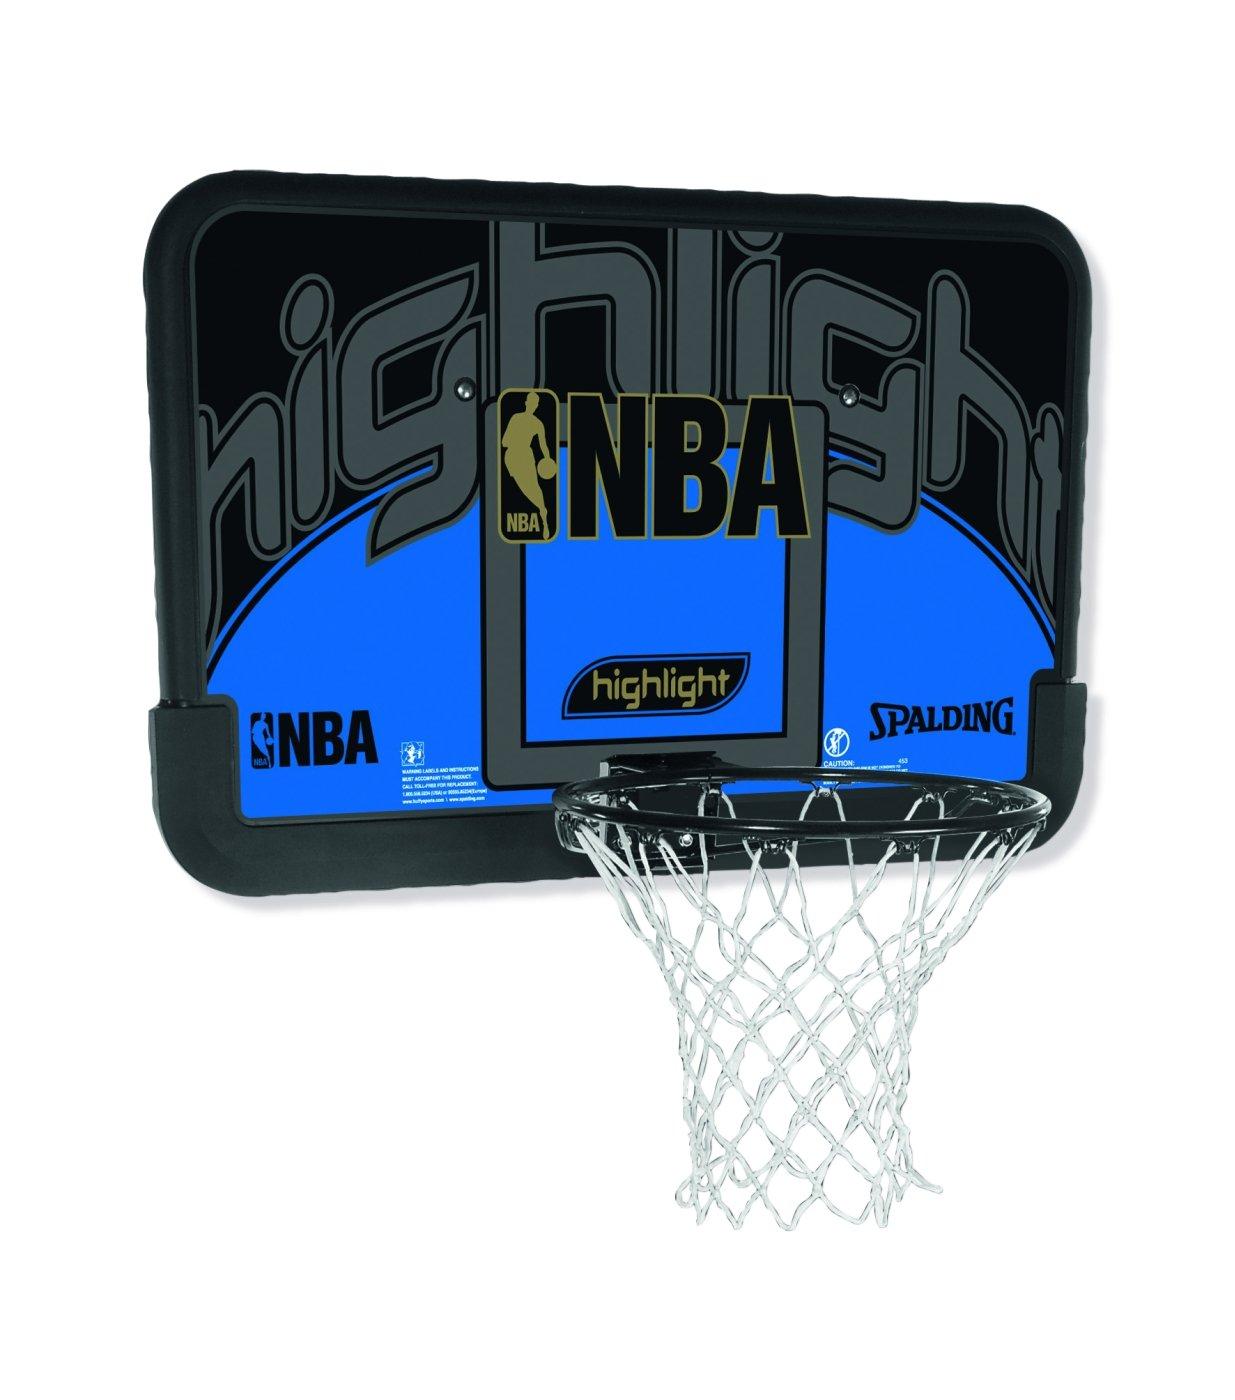 Unisex Adulto Spalding NBA Tablero